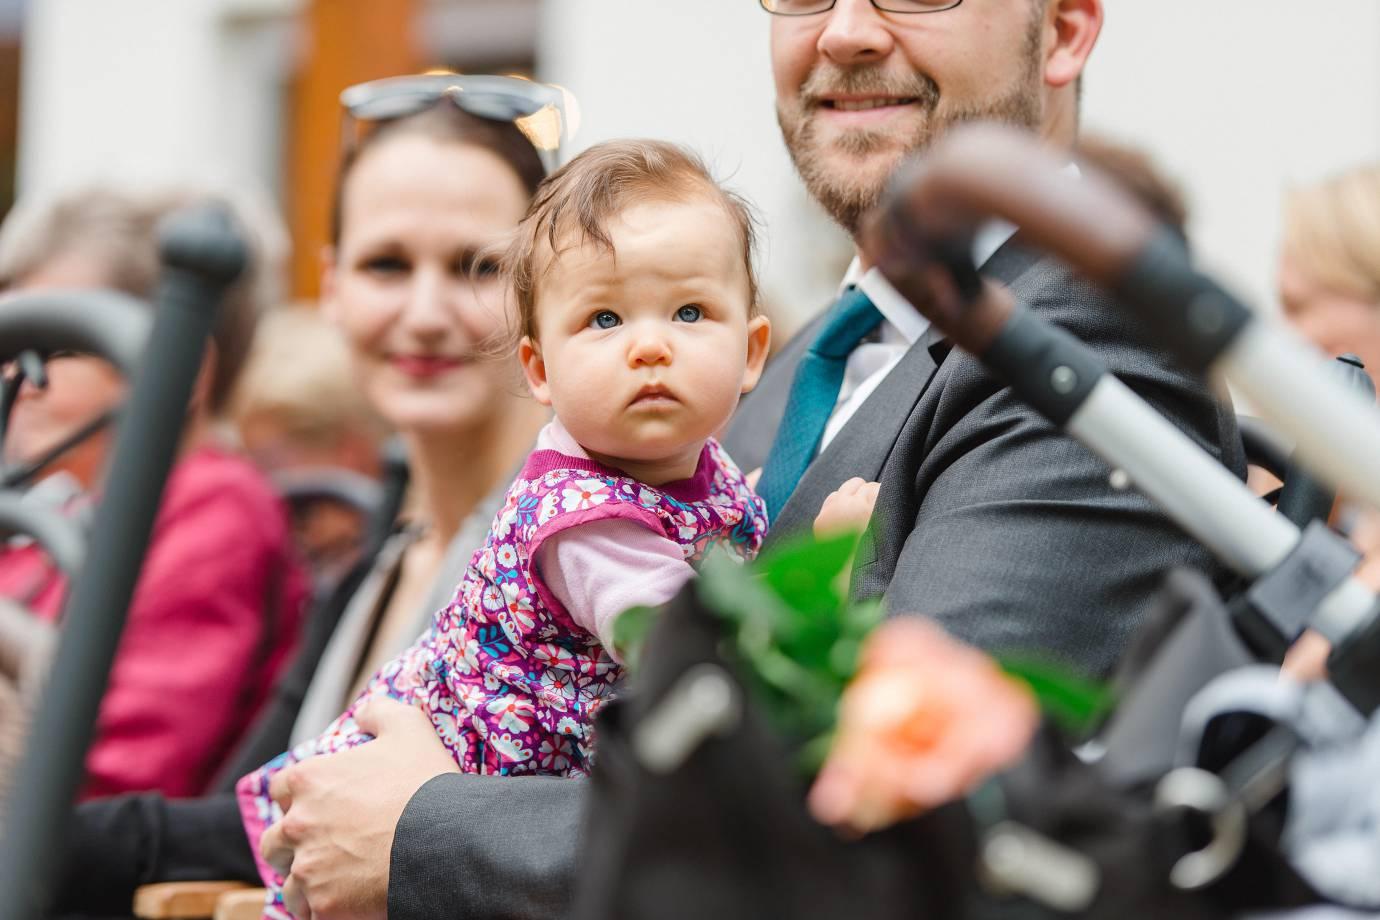 hochzeitsfotograf ganderkesee 073 - Christina+Andreas